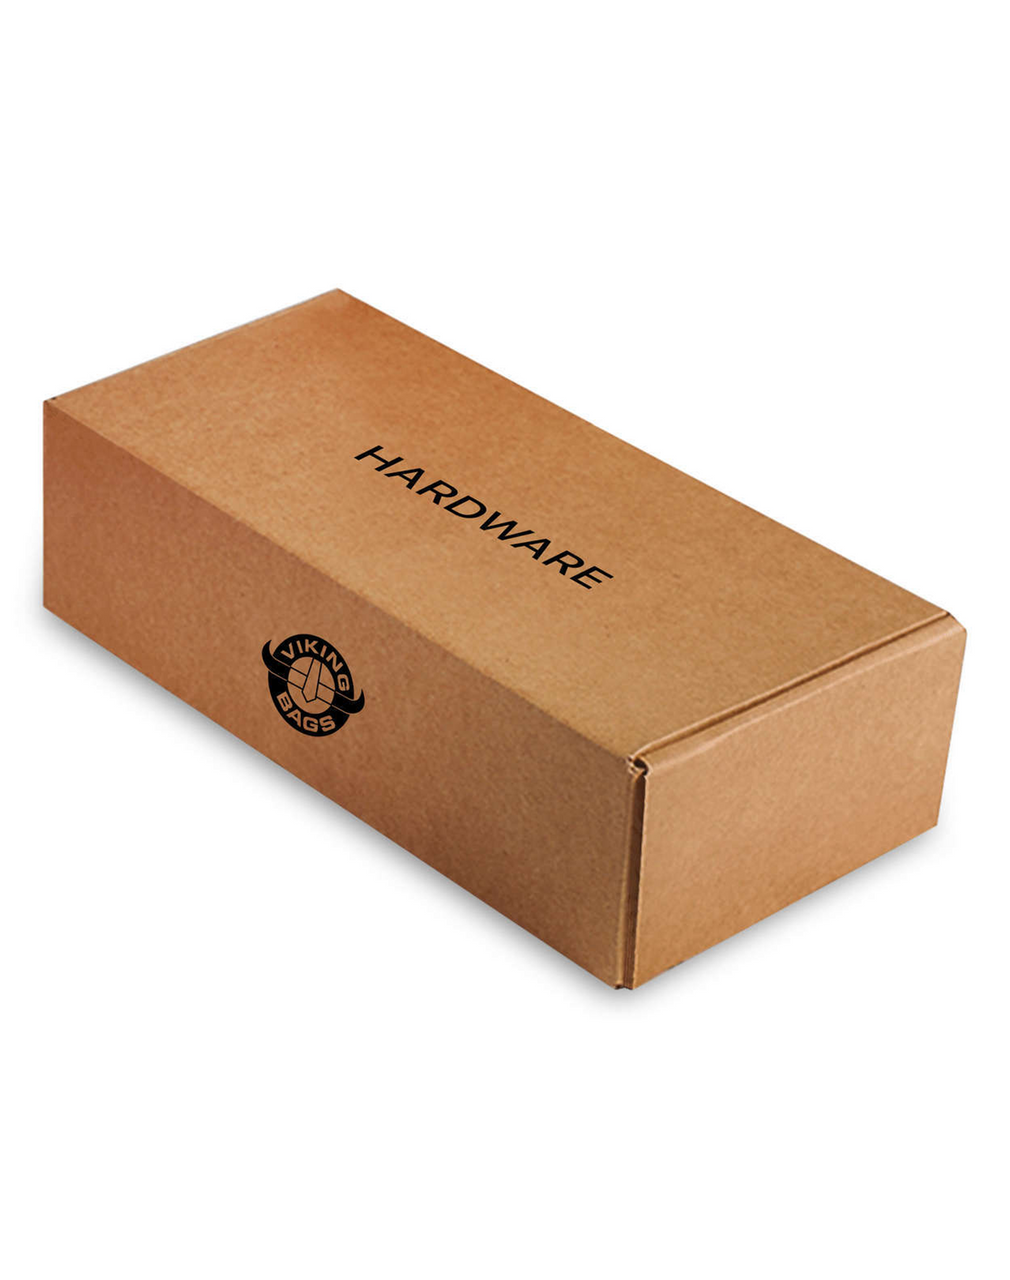 Honda VTX 1800 F Charger Single Strap Studded Medium Motorcycle Saddlebags Hardware Box